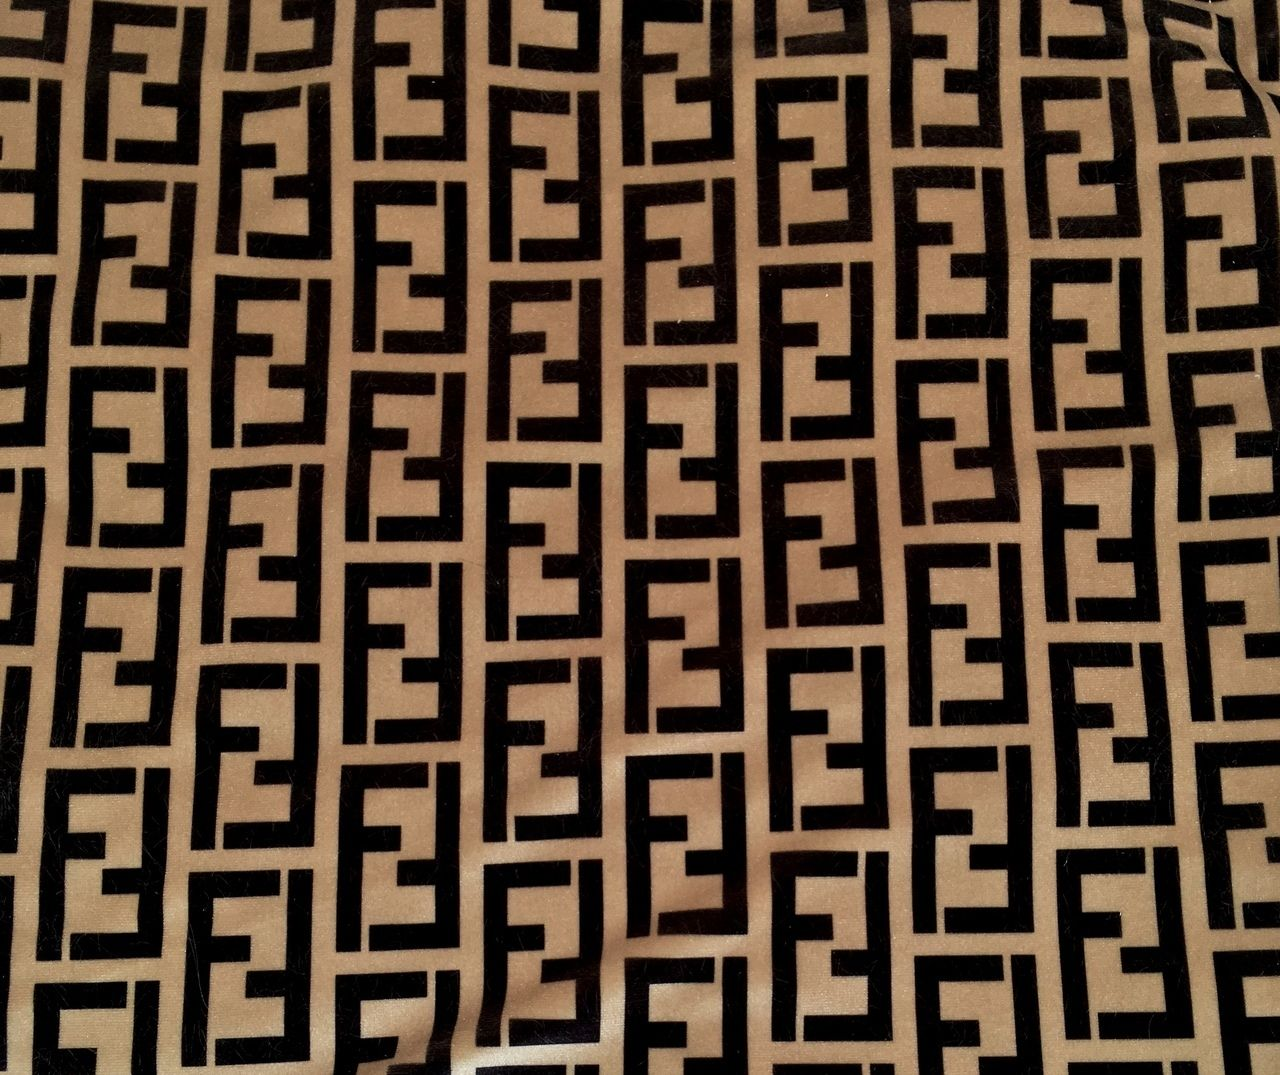 45aba48e6 Ritzy Baby Designs, LLC - Beige Fendi Velvet Designer Inspired Fabric by  the Yard,